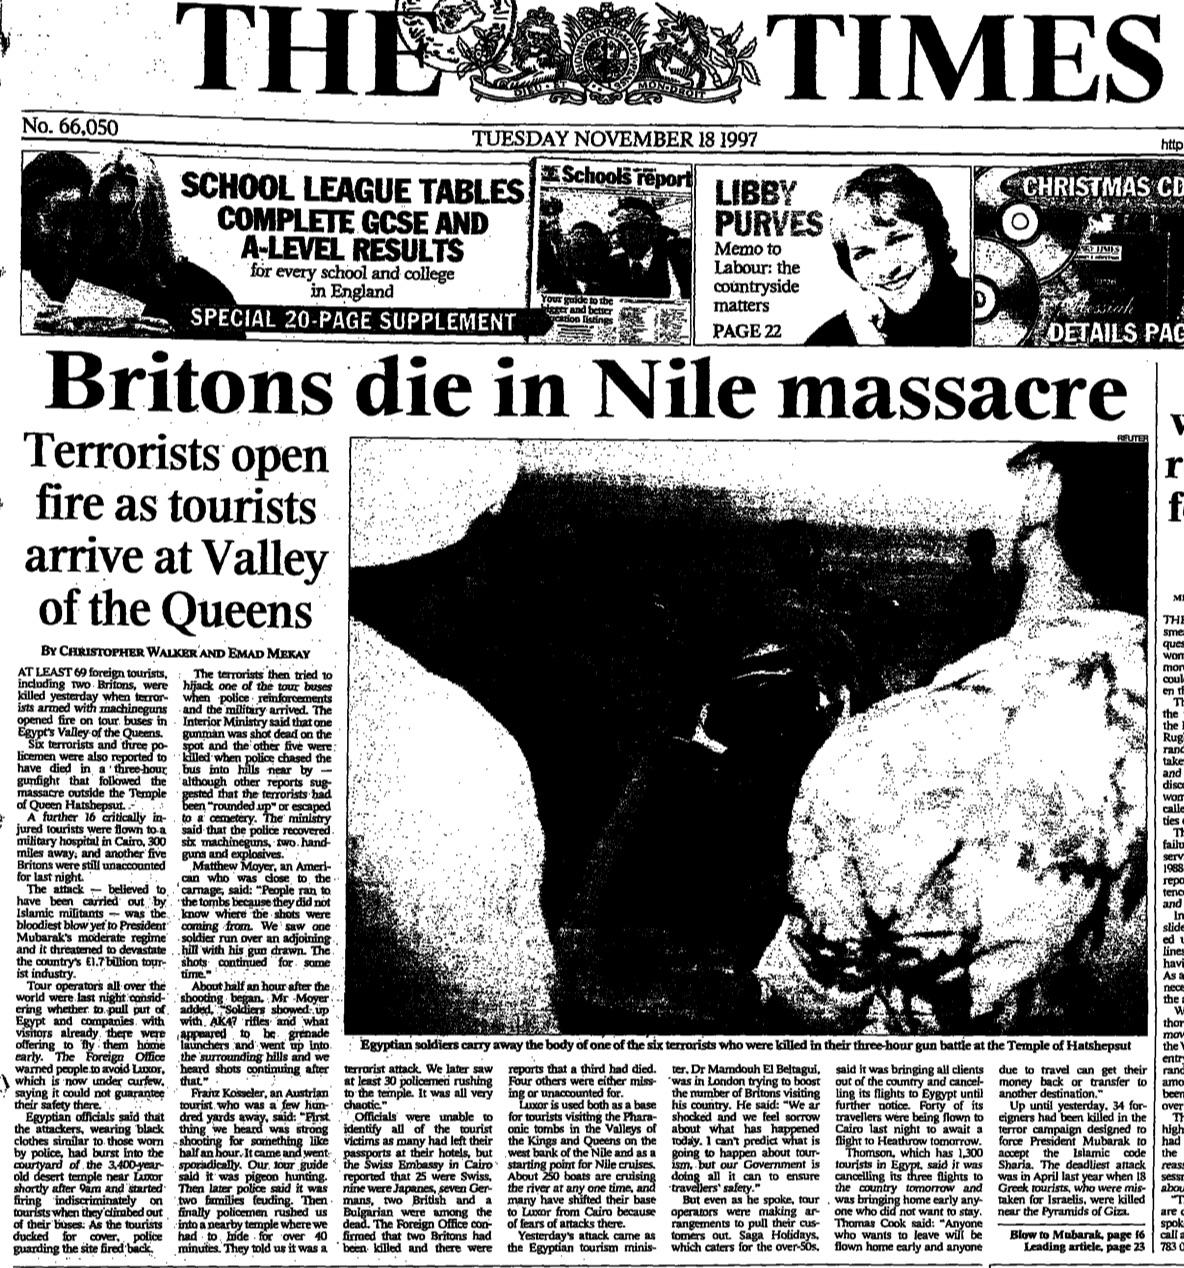 The Times, November 18, 1997